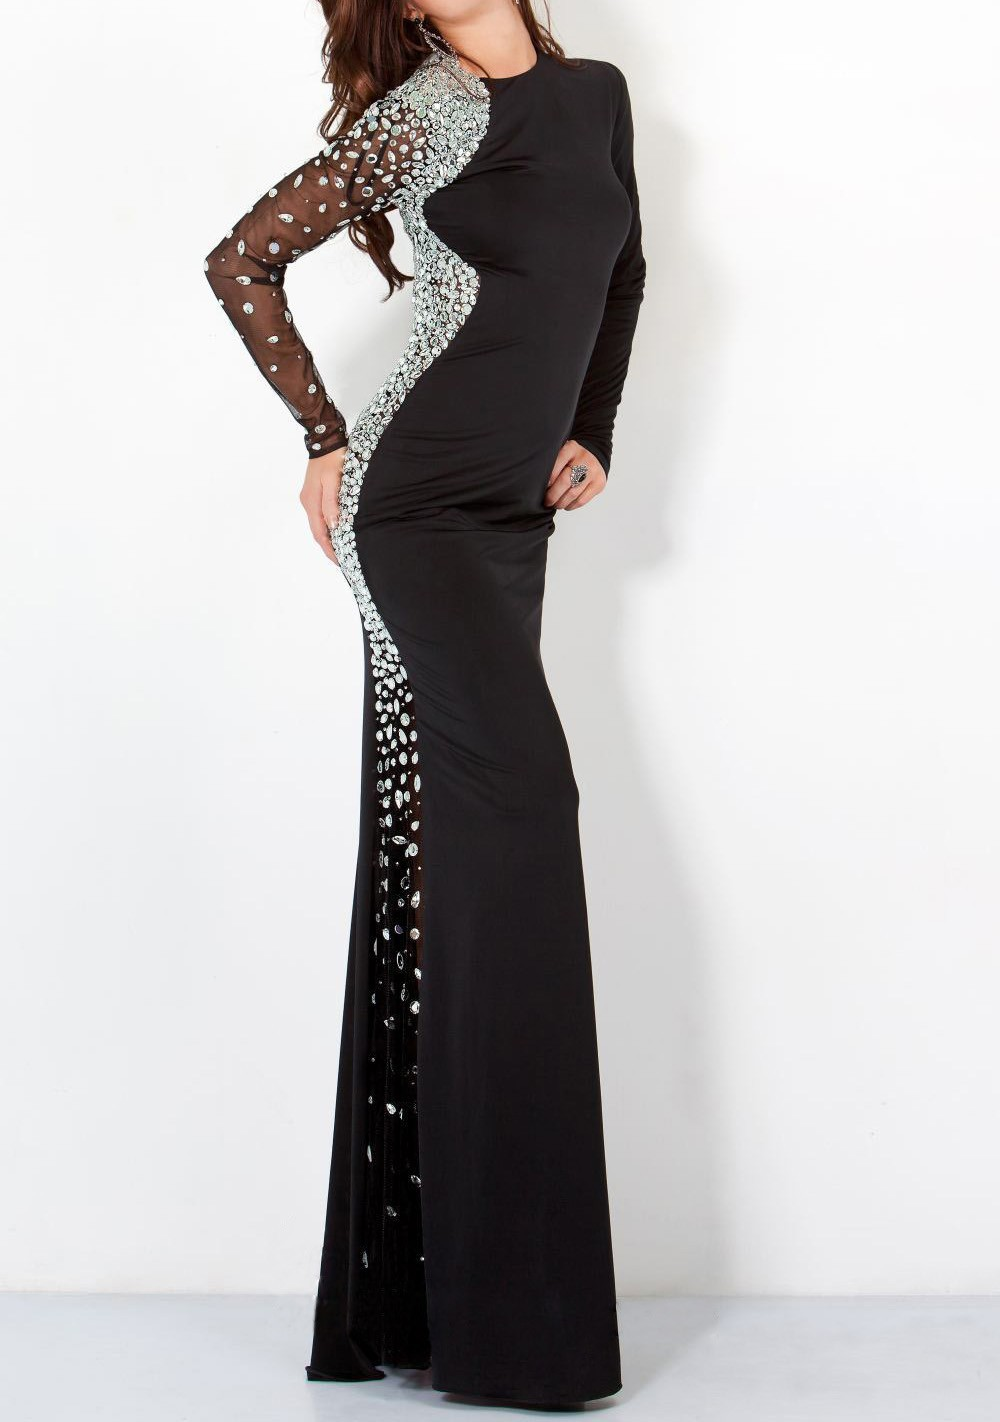 100% Beading Handwork Backless Long Sleeve Black Evening Dresses OL102100